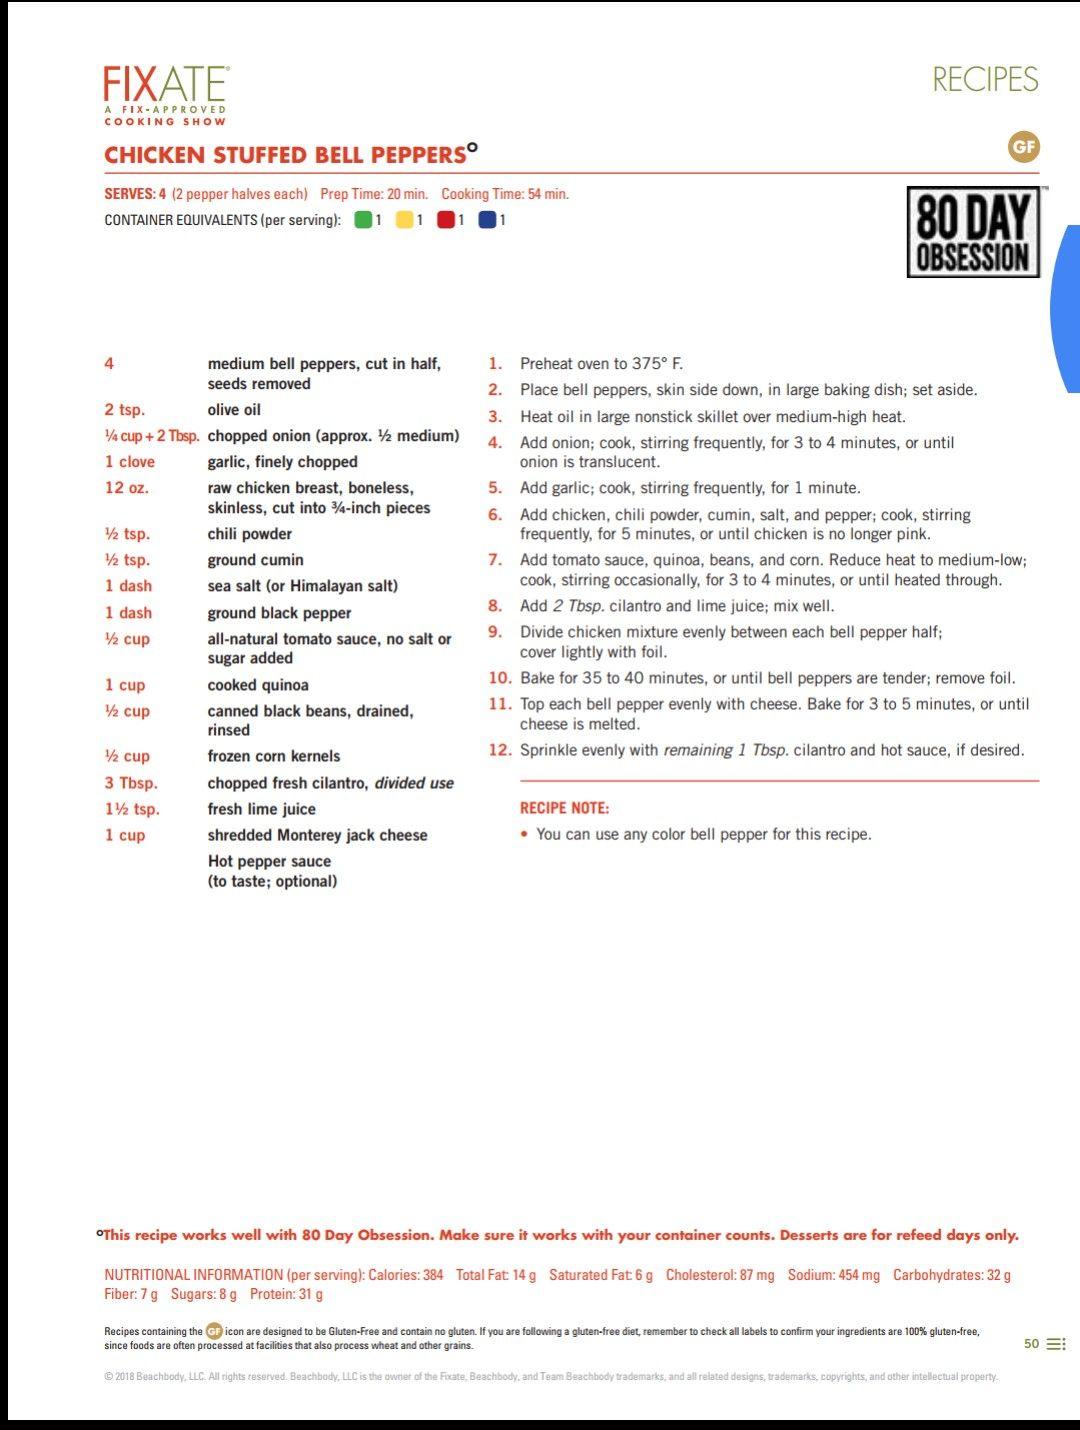 Chicken Stuffed Bell Peppers 21 Day Fixate Recipes 21 Day Fix Menu Fixate Cookbook